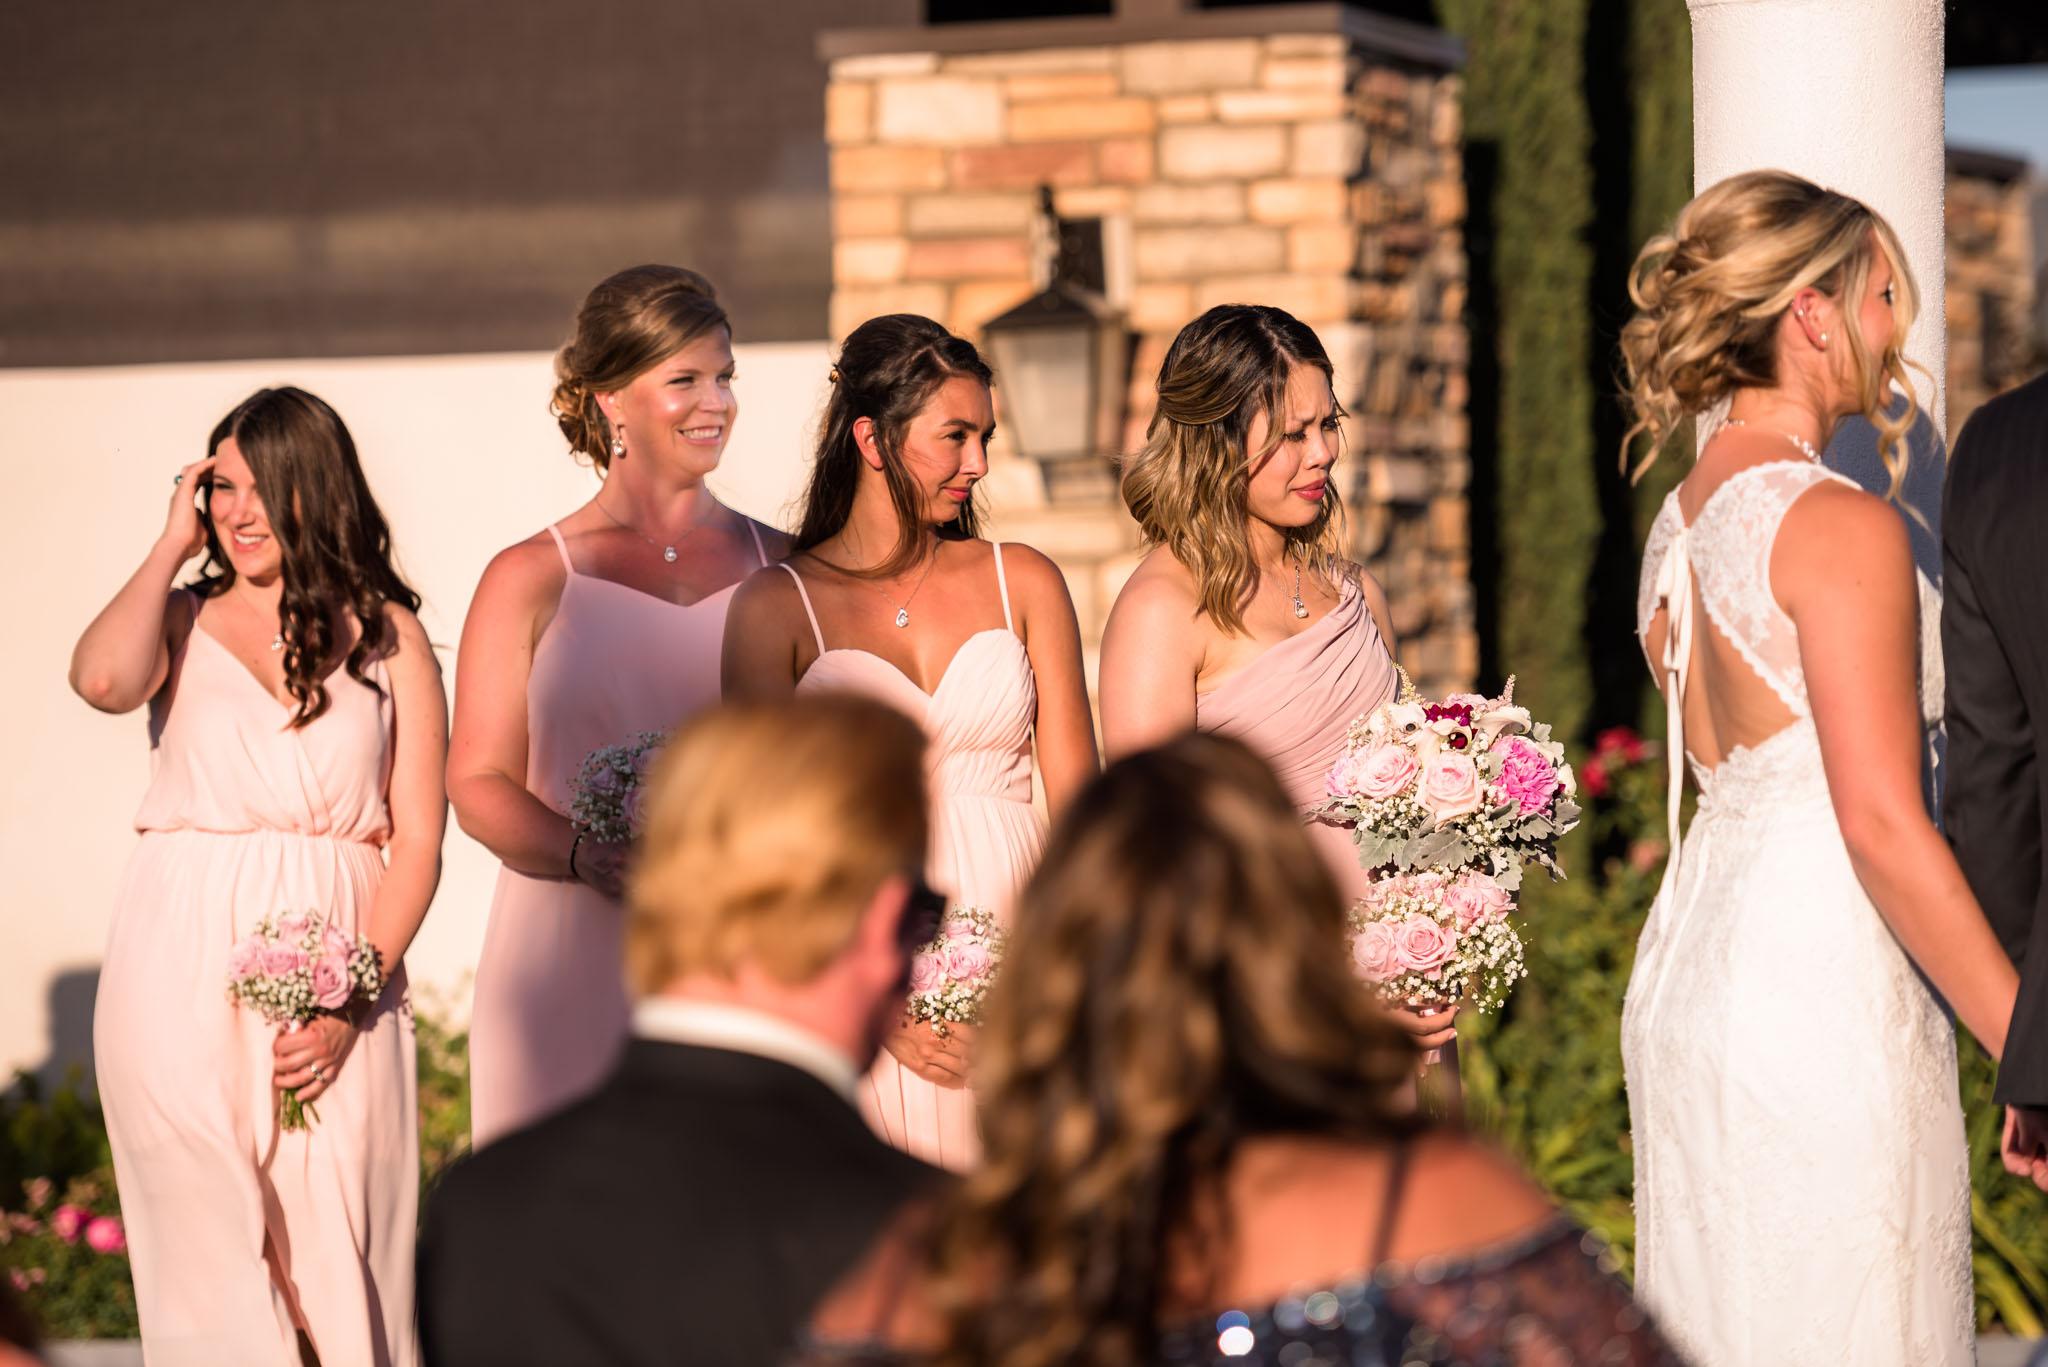 Avensole-Winery-Temecula-Wedding-Josh-and-Olivia-3522.JPG